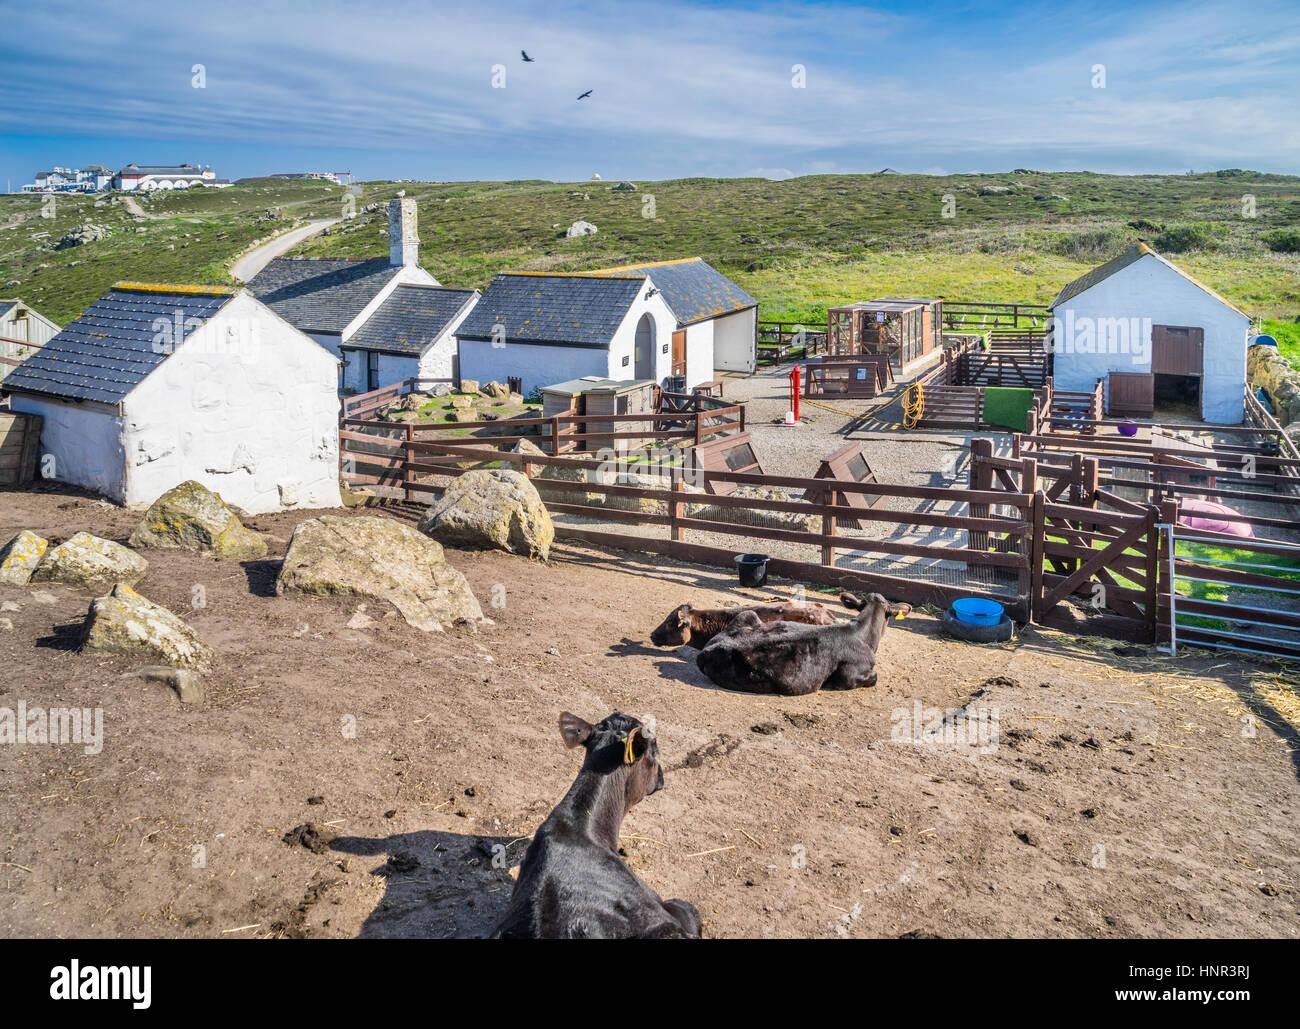 United Kingdom, South West England, Cornwall, Greeb Farm at Land's End - Stock Image